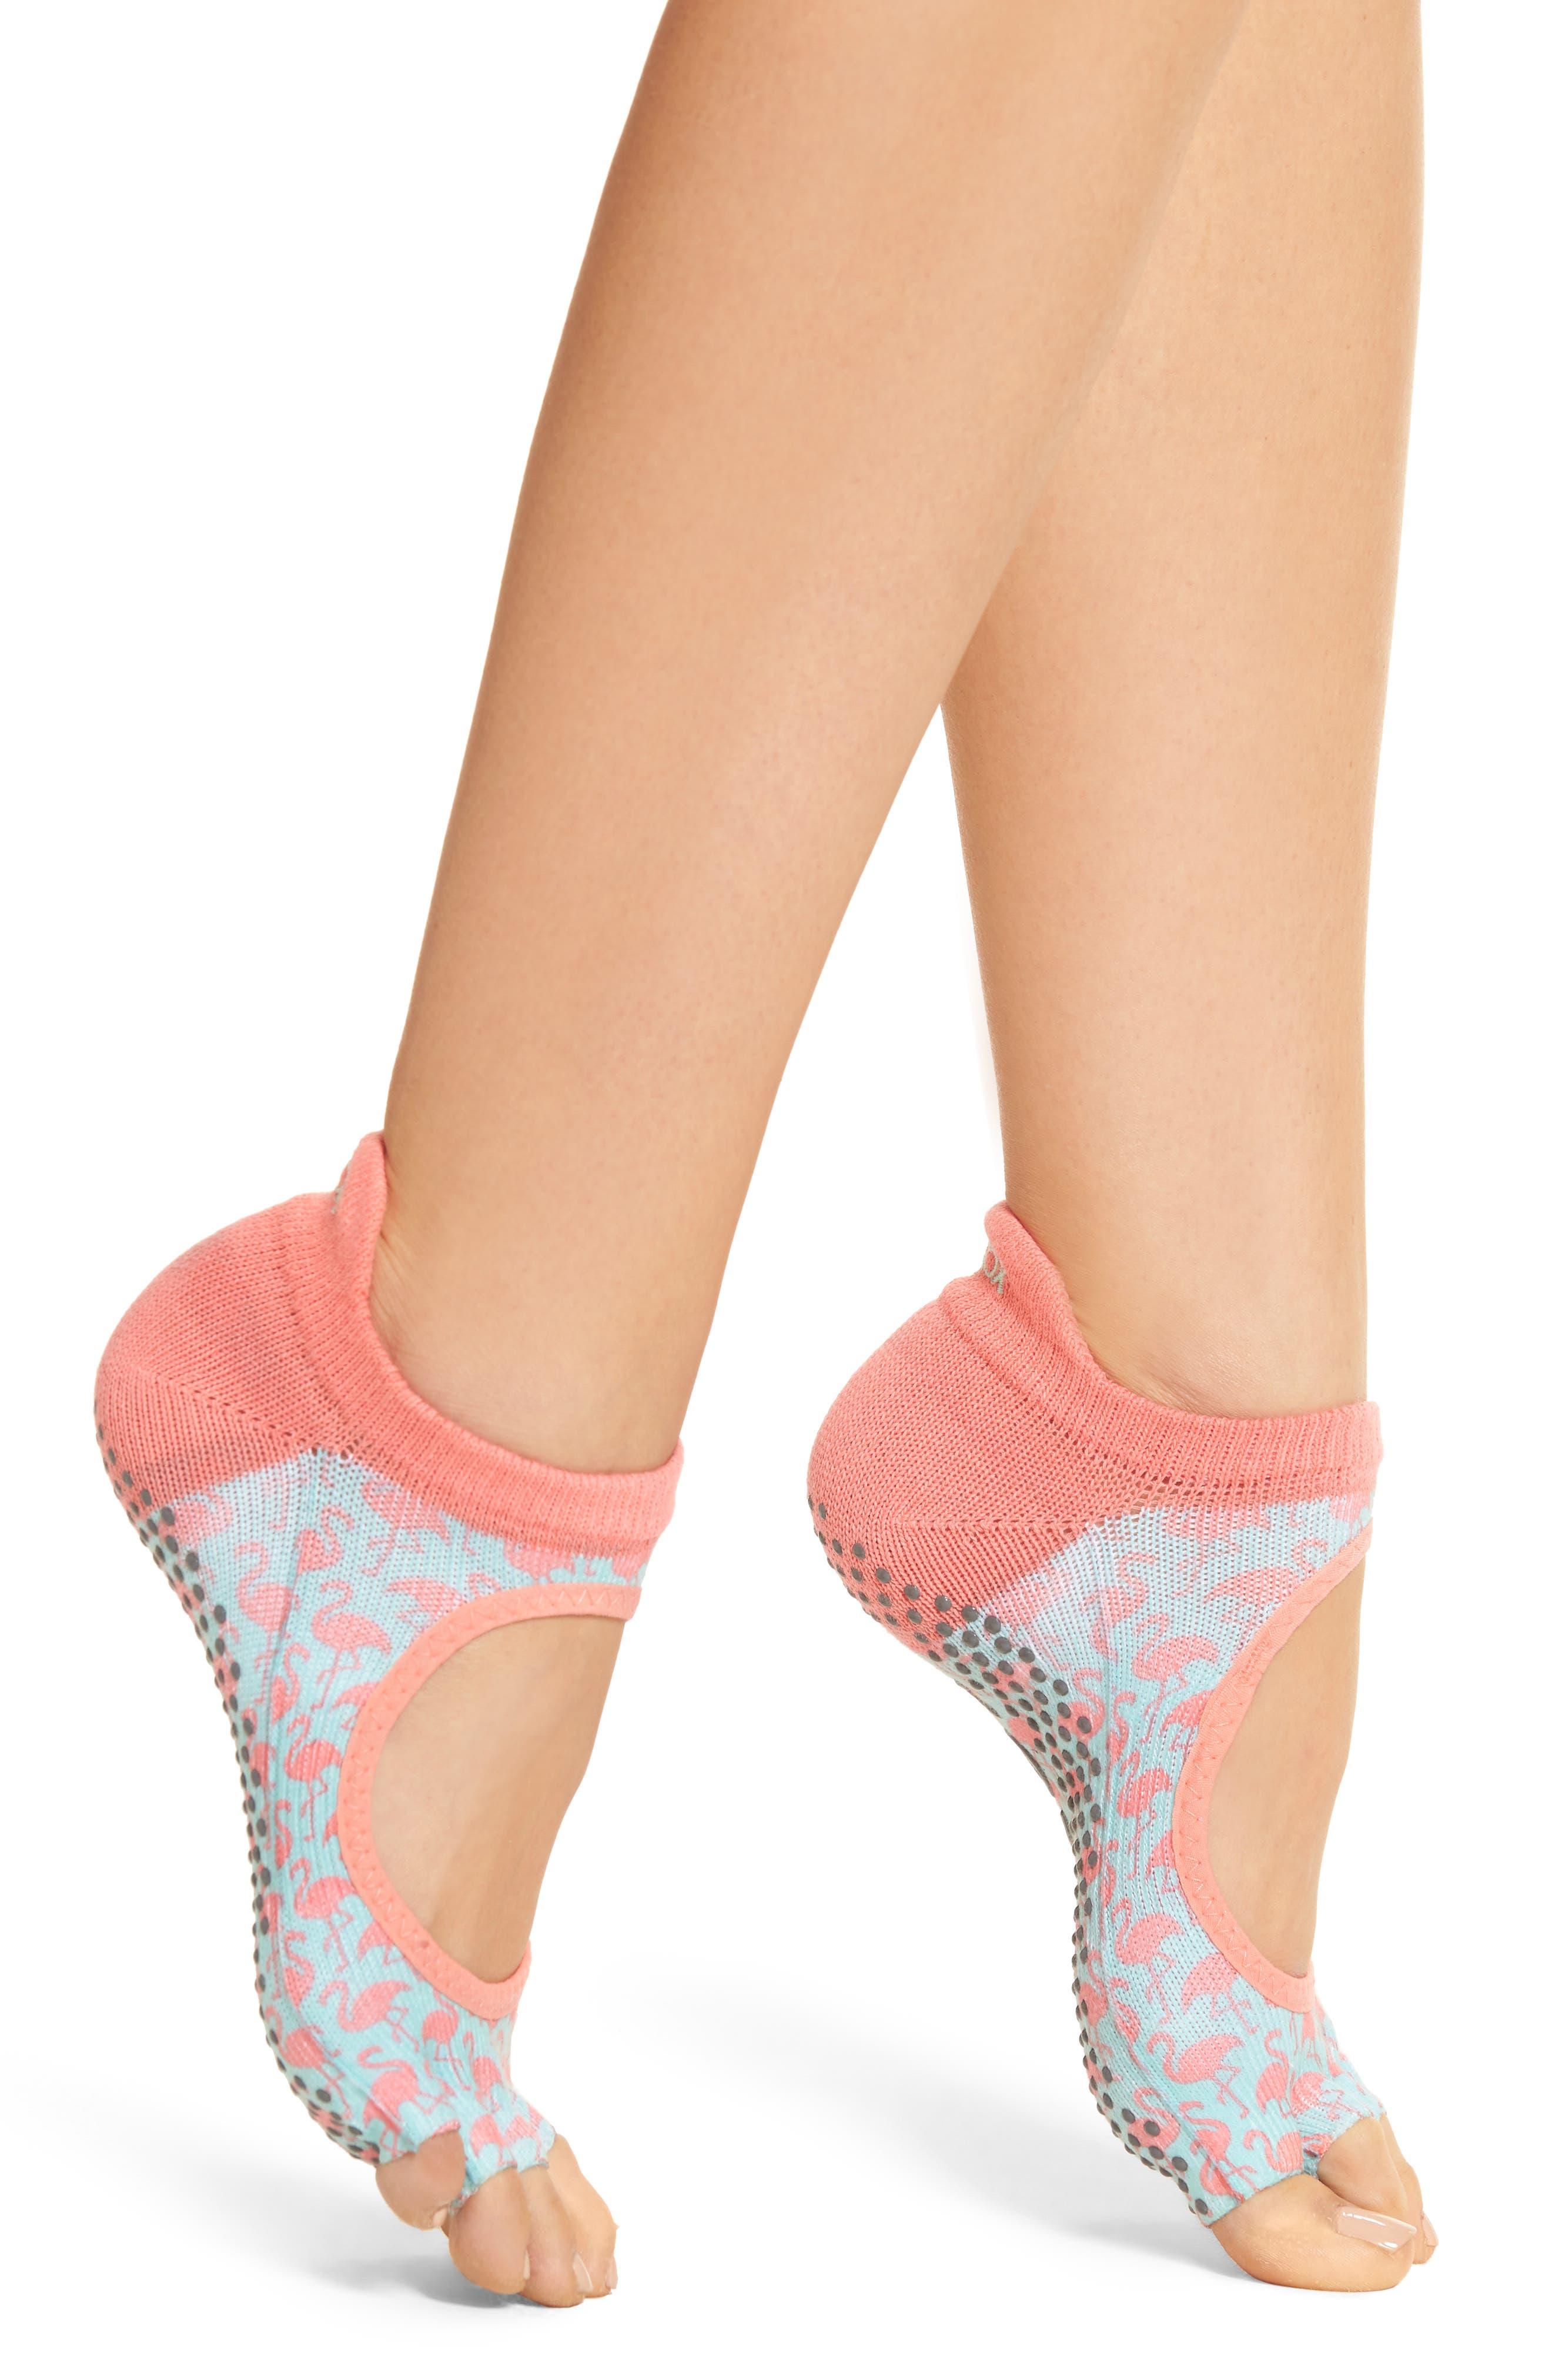 Alternate Image 1 Selected - ToeSox Bellarina Half Toe Gripper Socks